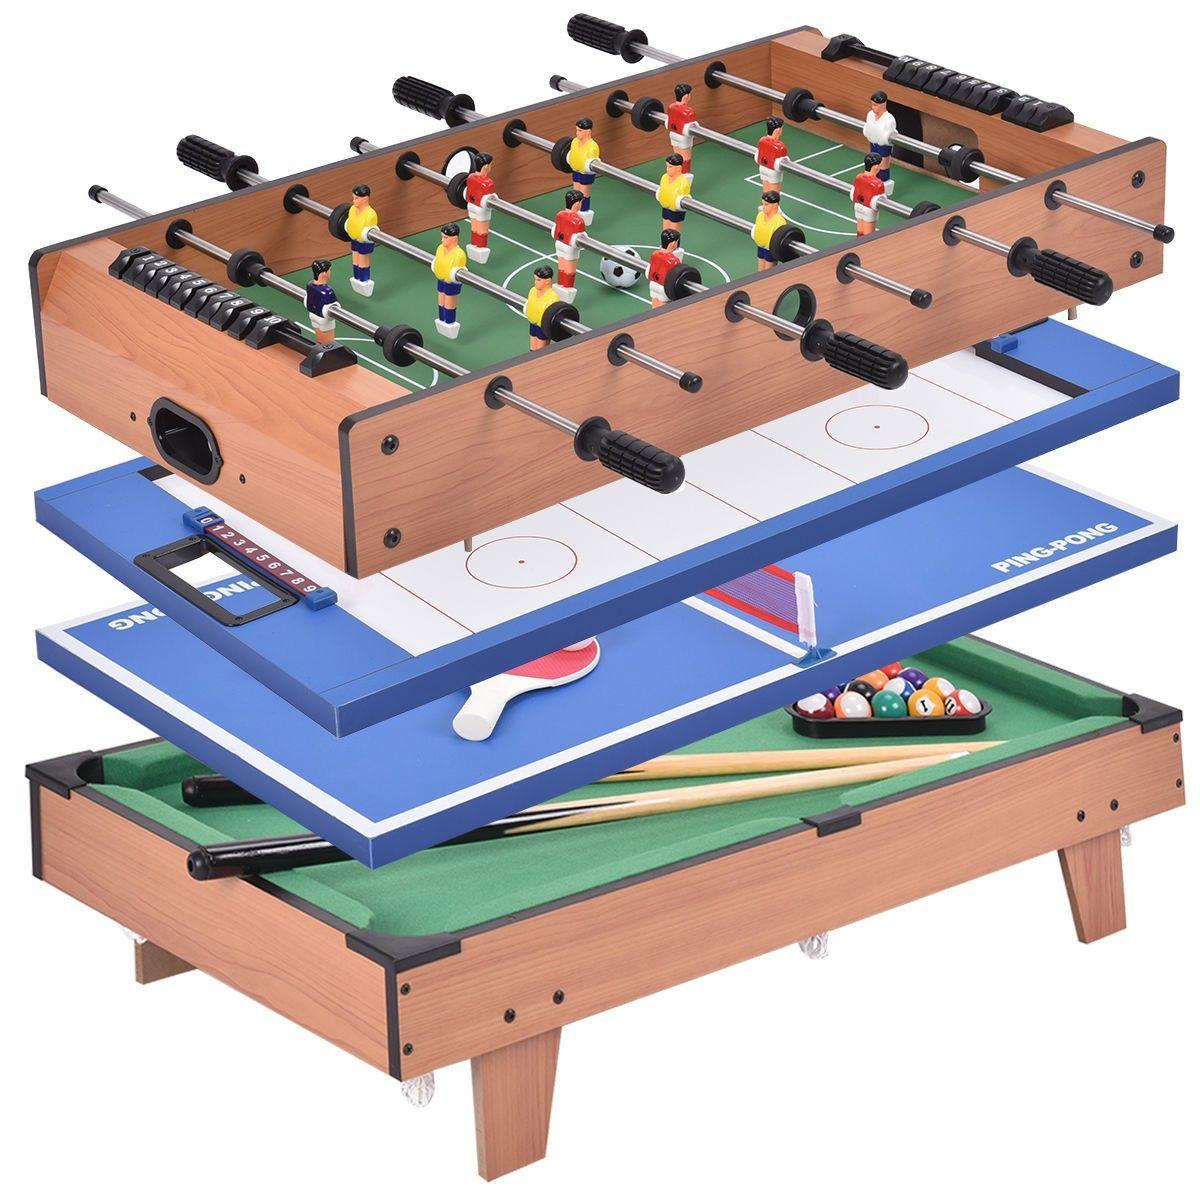 4 In 1 Multi Game Hockey Tennis Football Pool Table